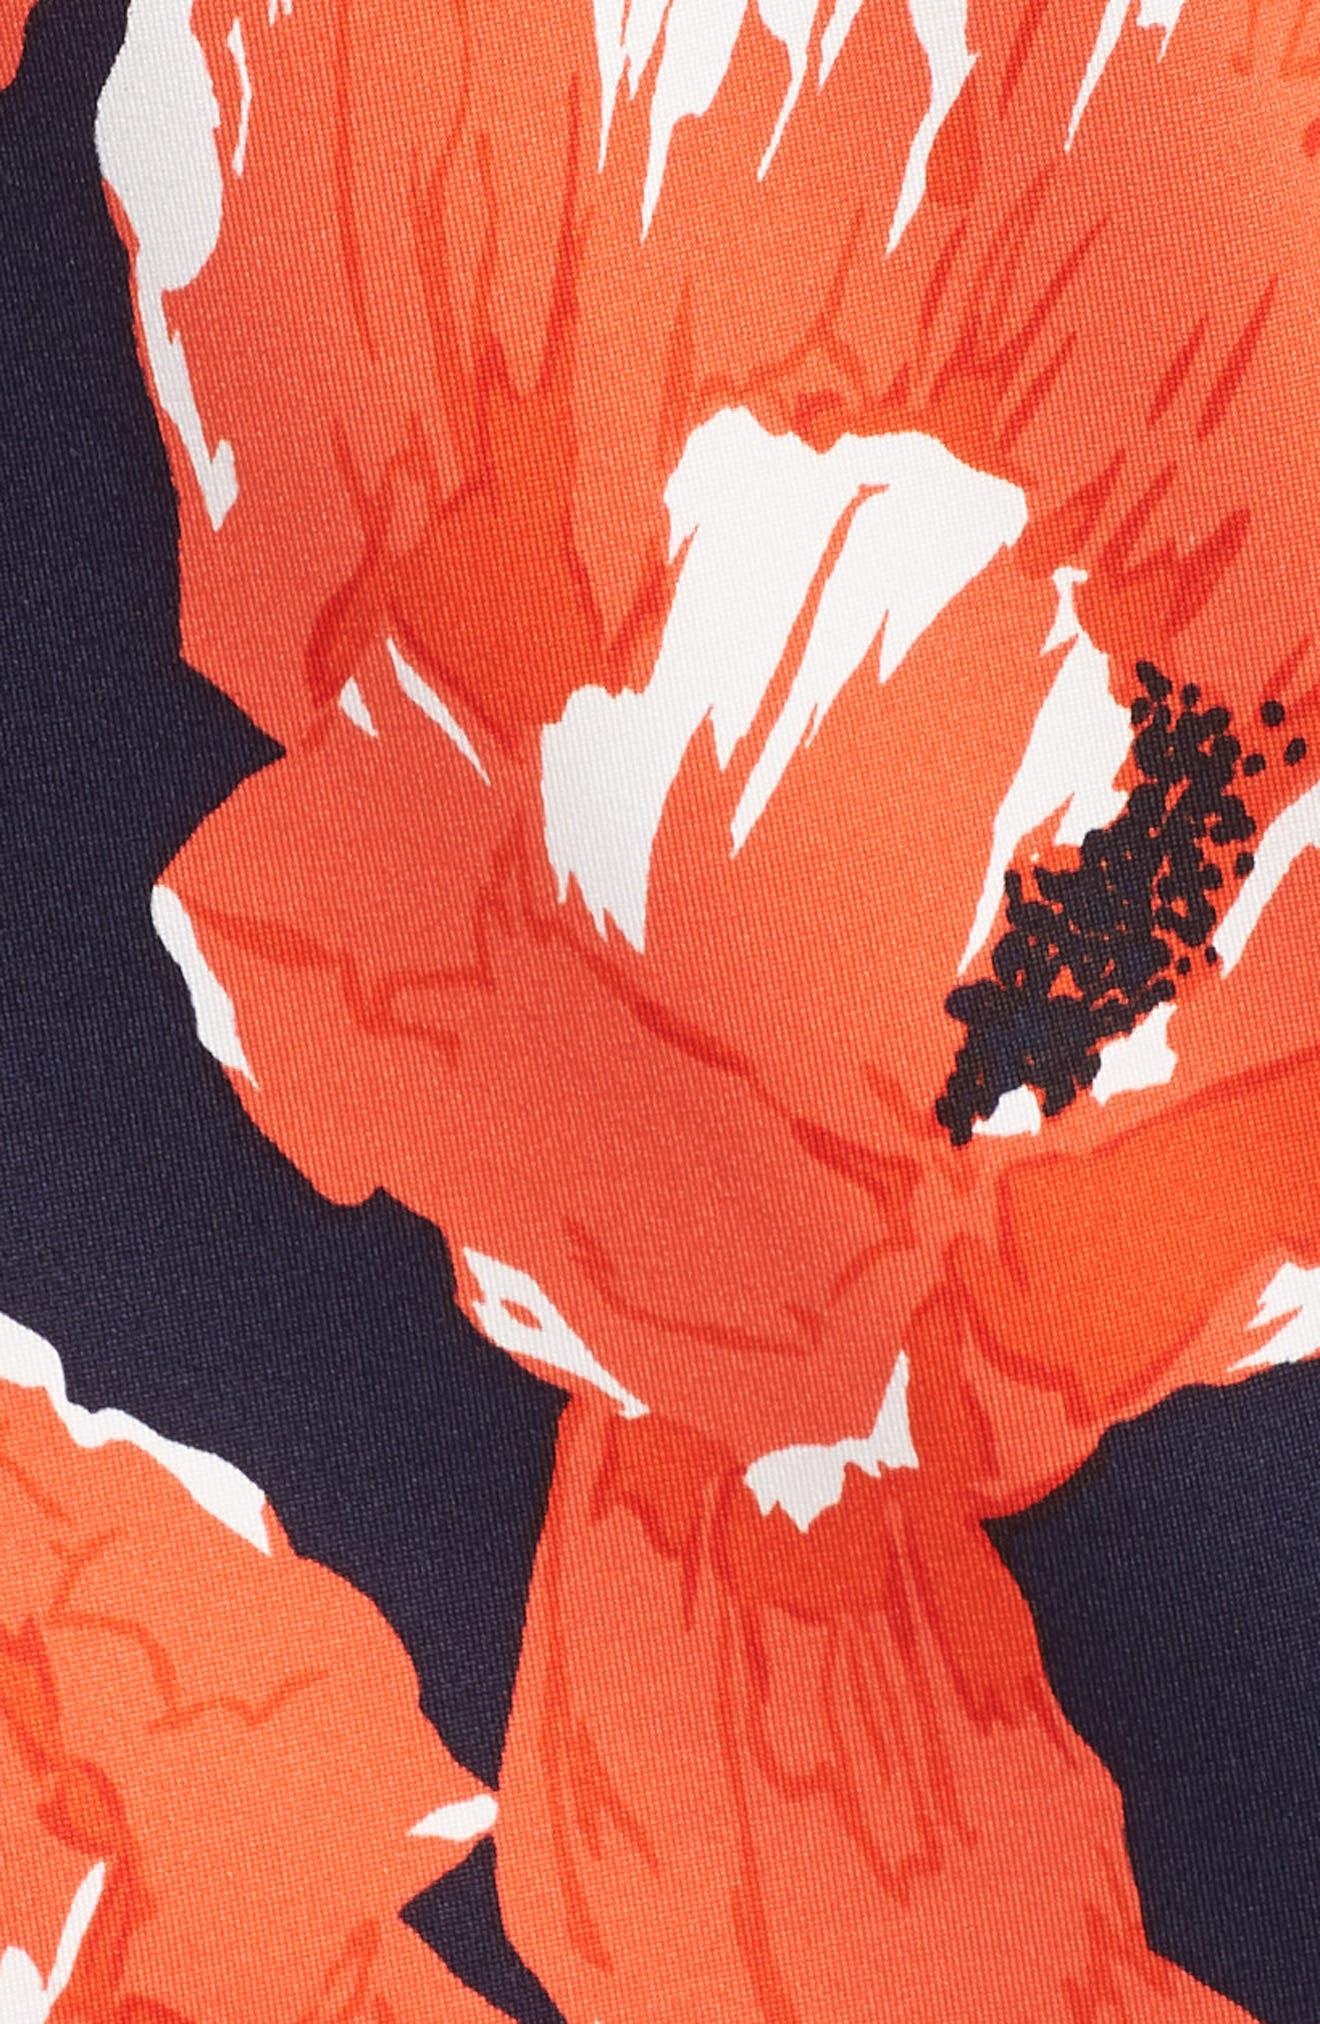 Lexi Poppy Cold Shoulder Shift Dress,                             Alternate thumbnail 6, color,                             Indigo/ Red Ginger